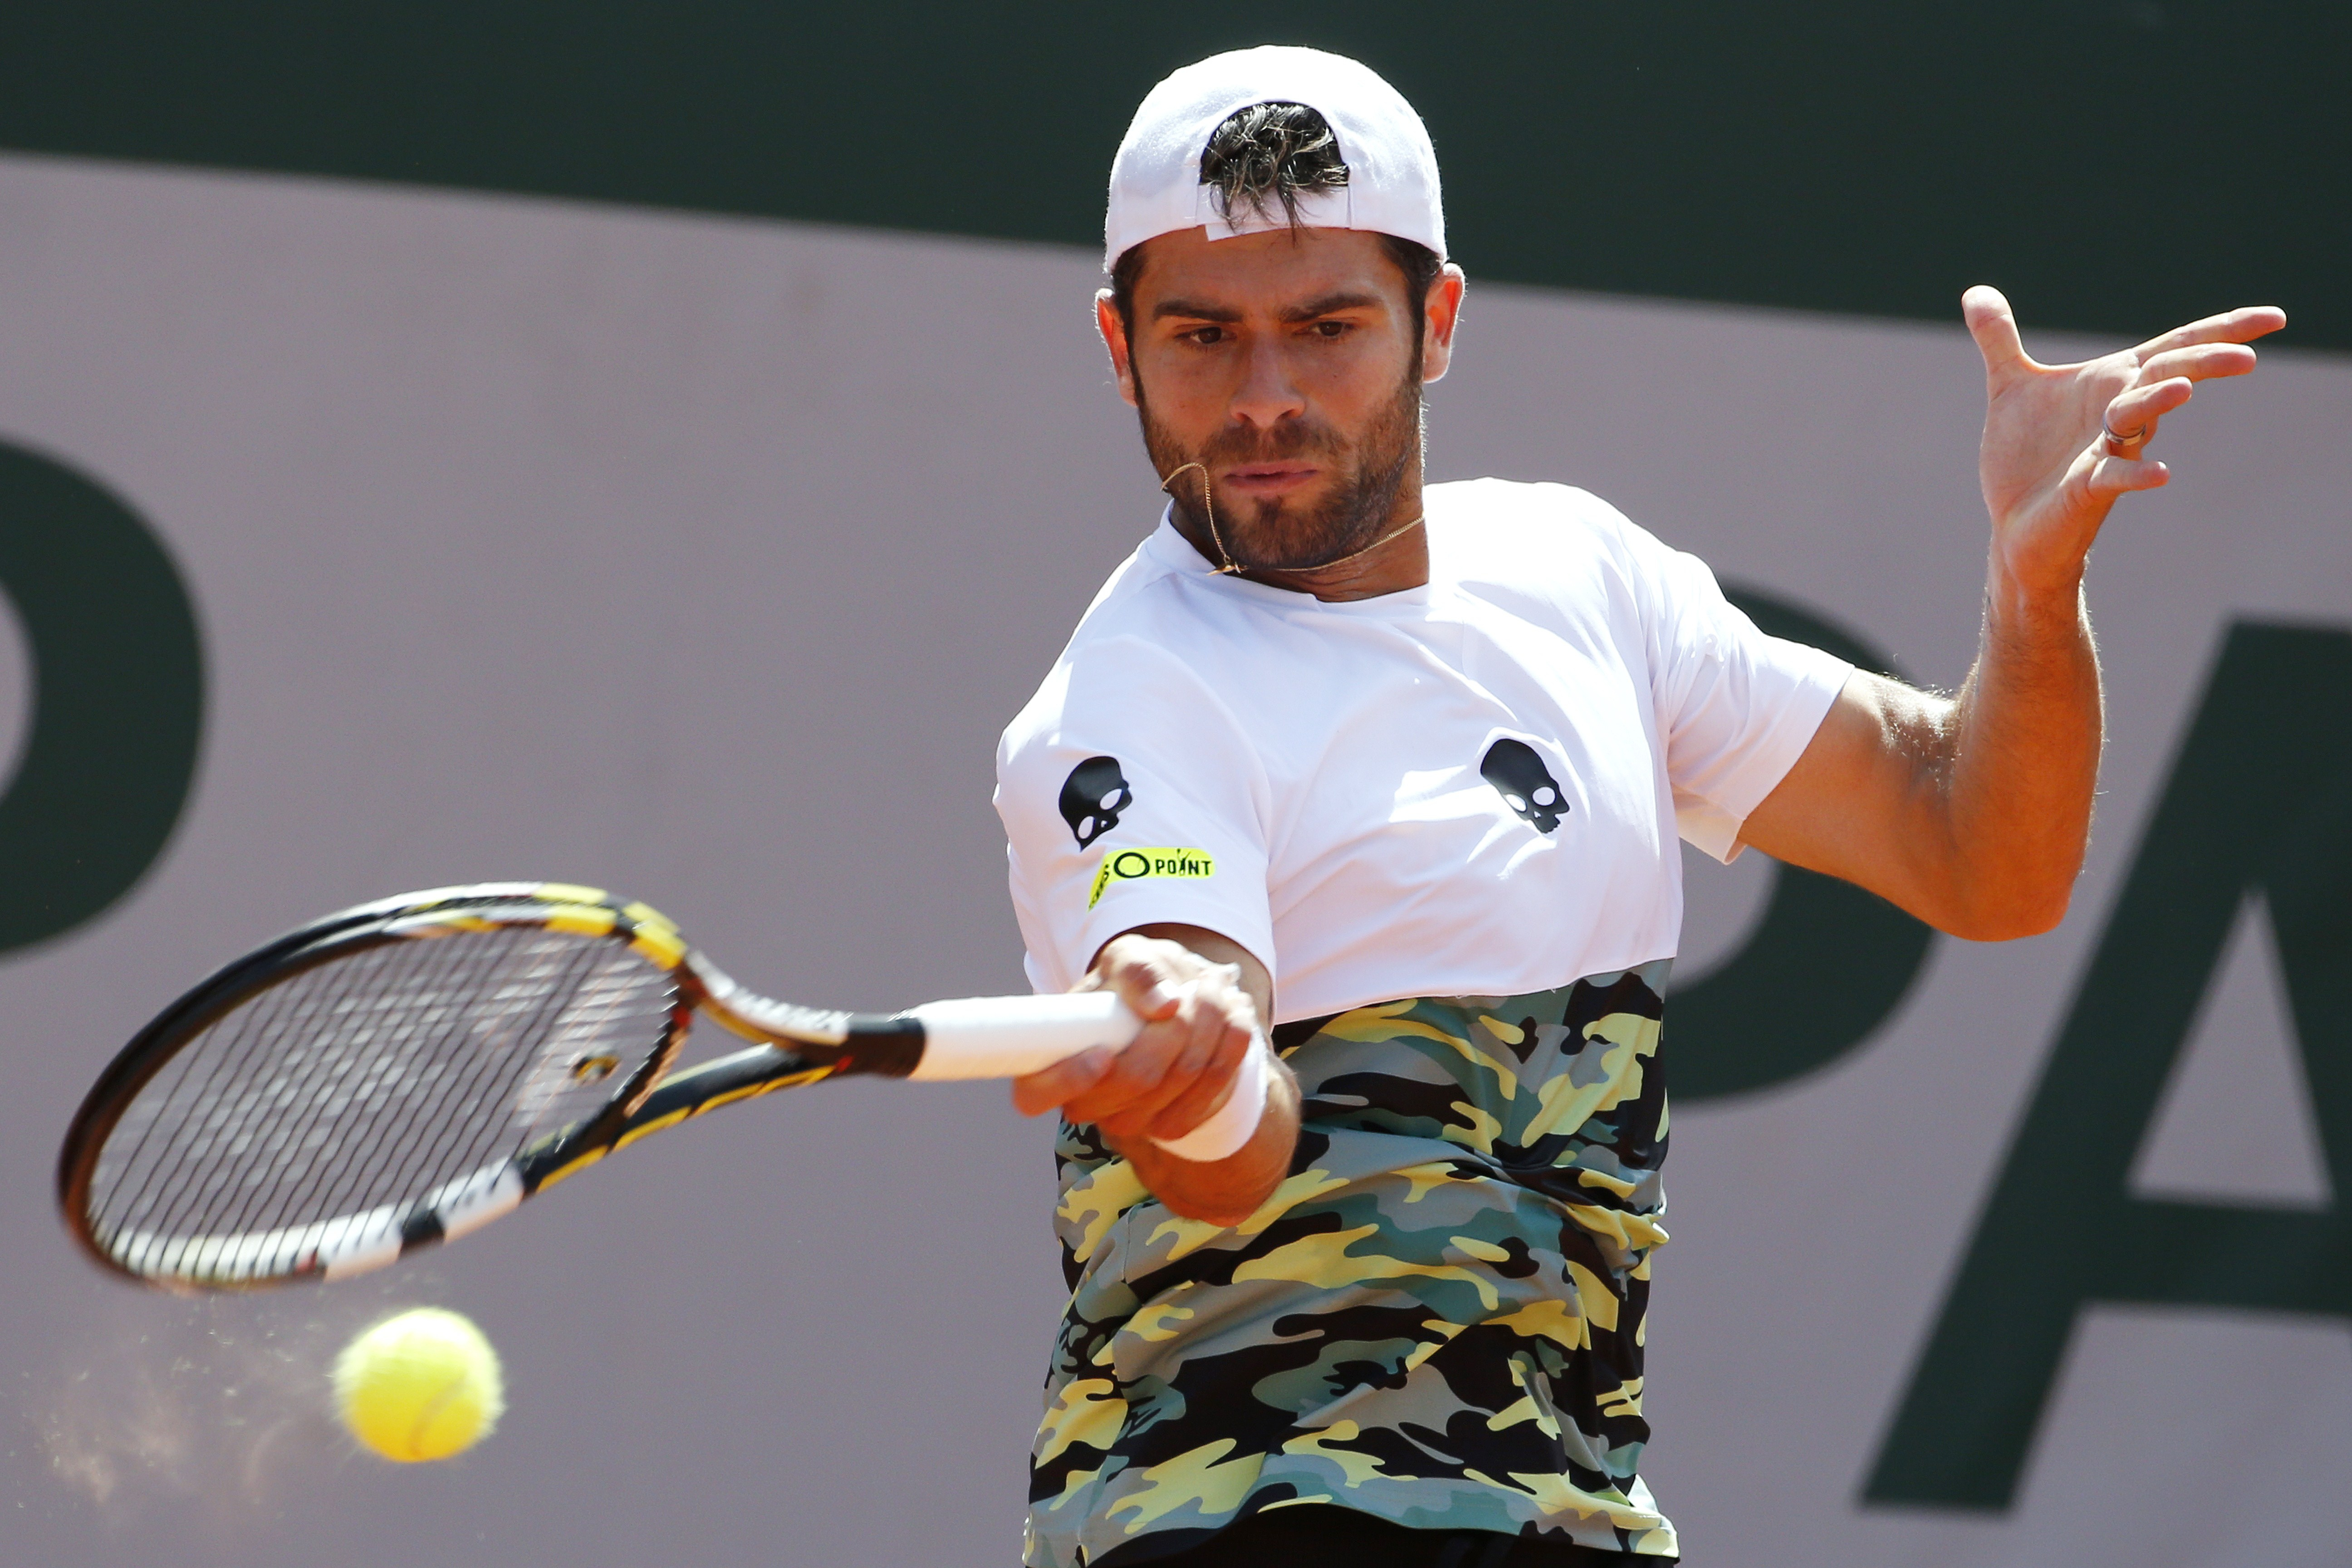 Ferrer d. Bolelli 6–3, 1–6, 5–7, 6–0, 6–1.